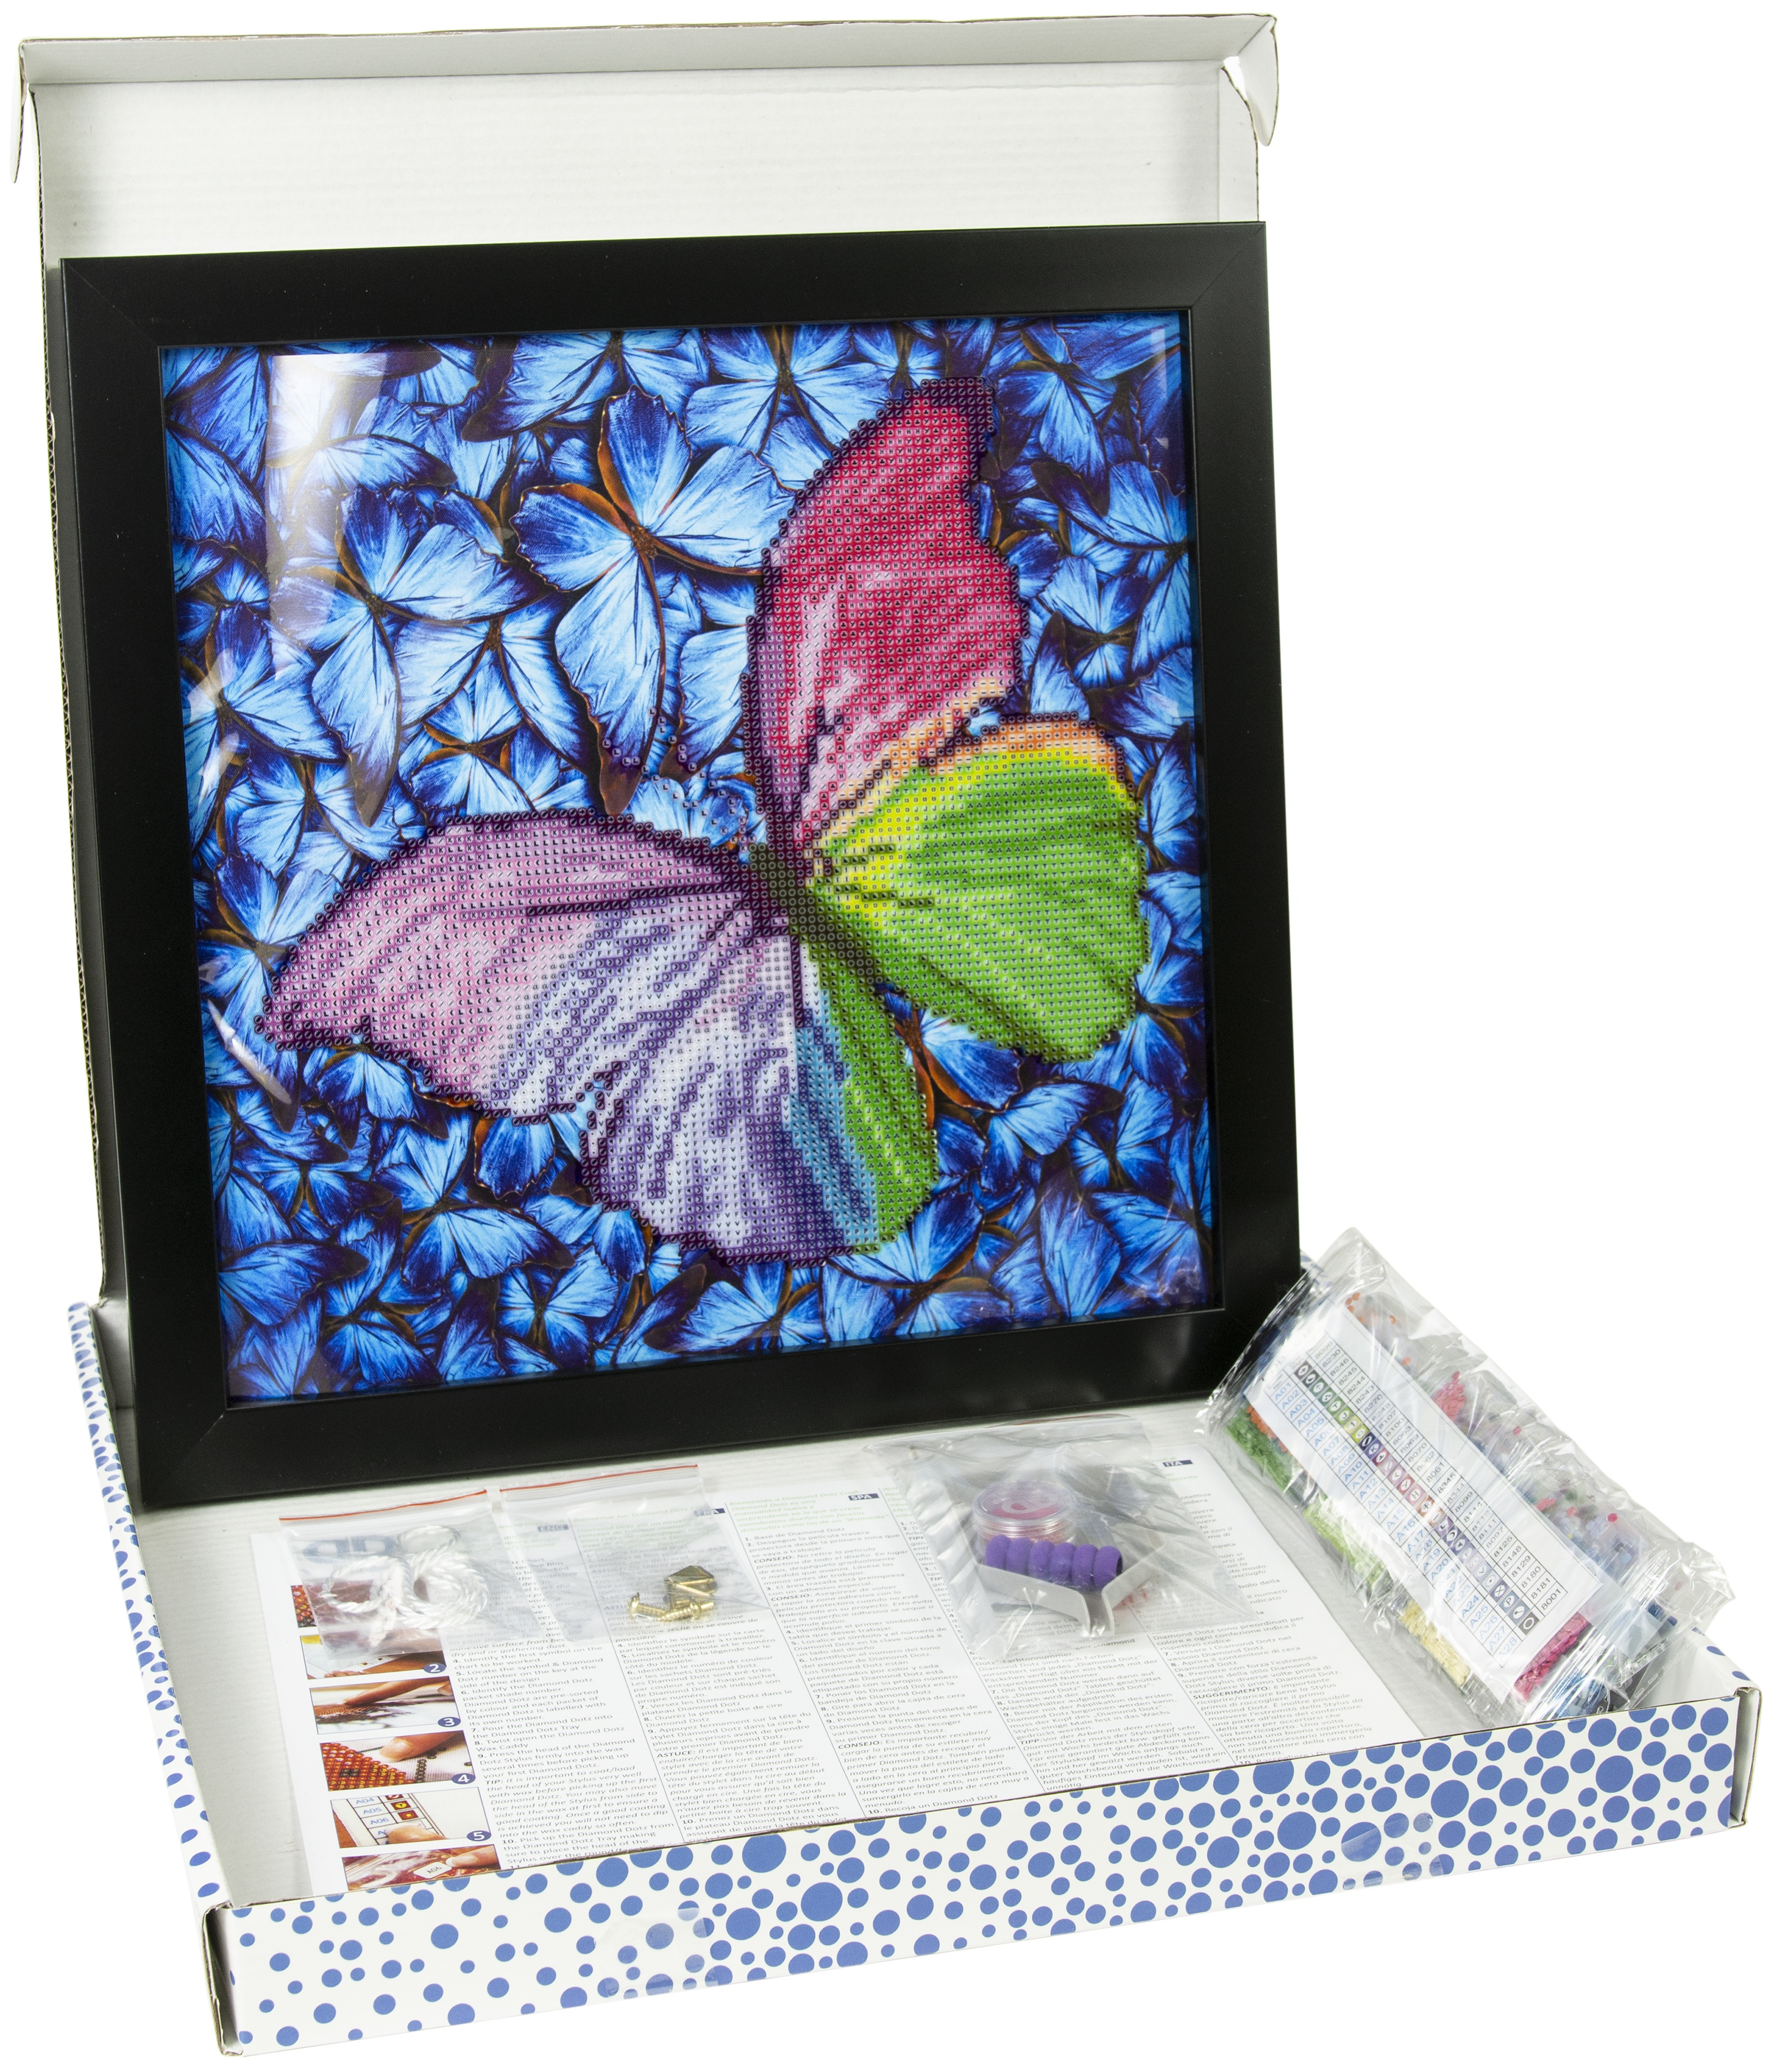 Diamond Dotz Diamond Embroidery Facet Art Kit W/ Frame-Flutter By Pink